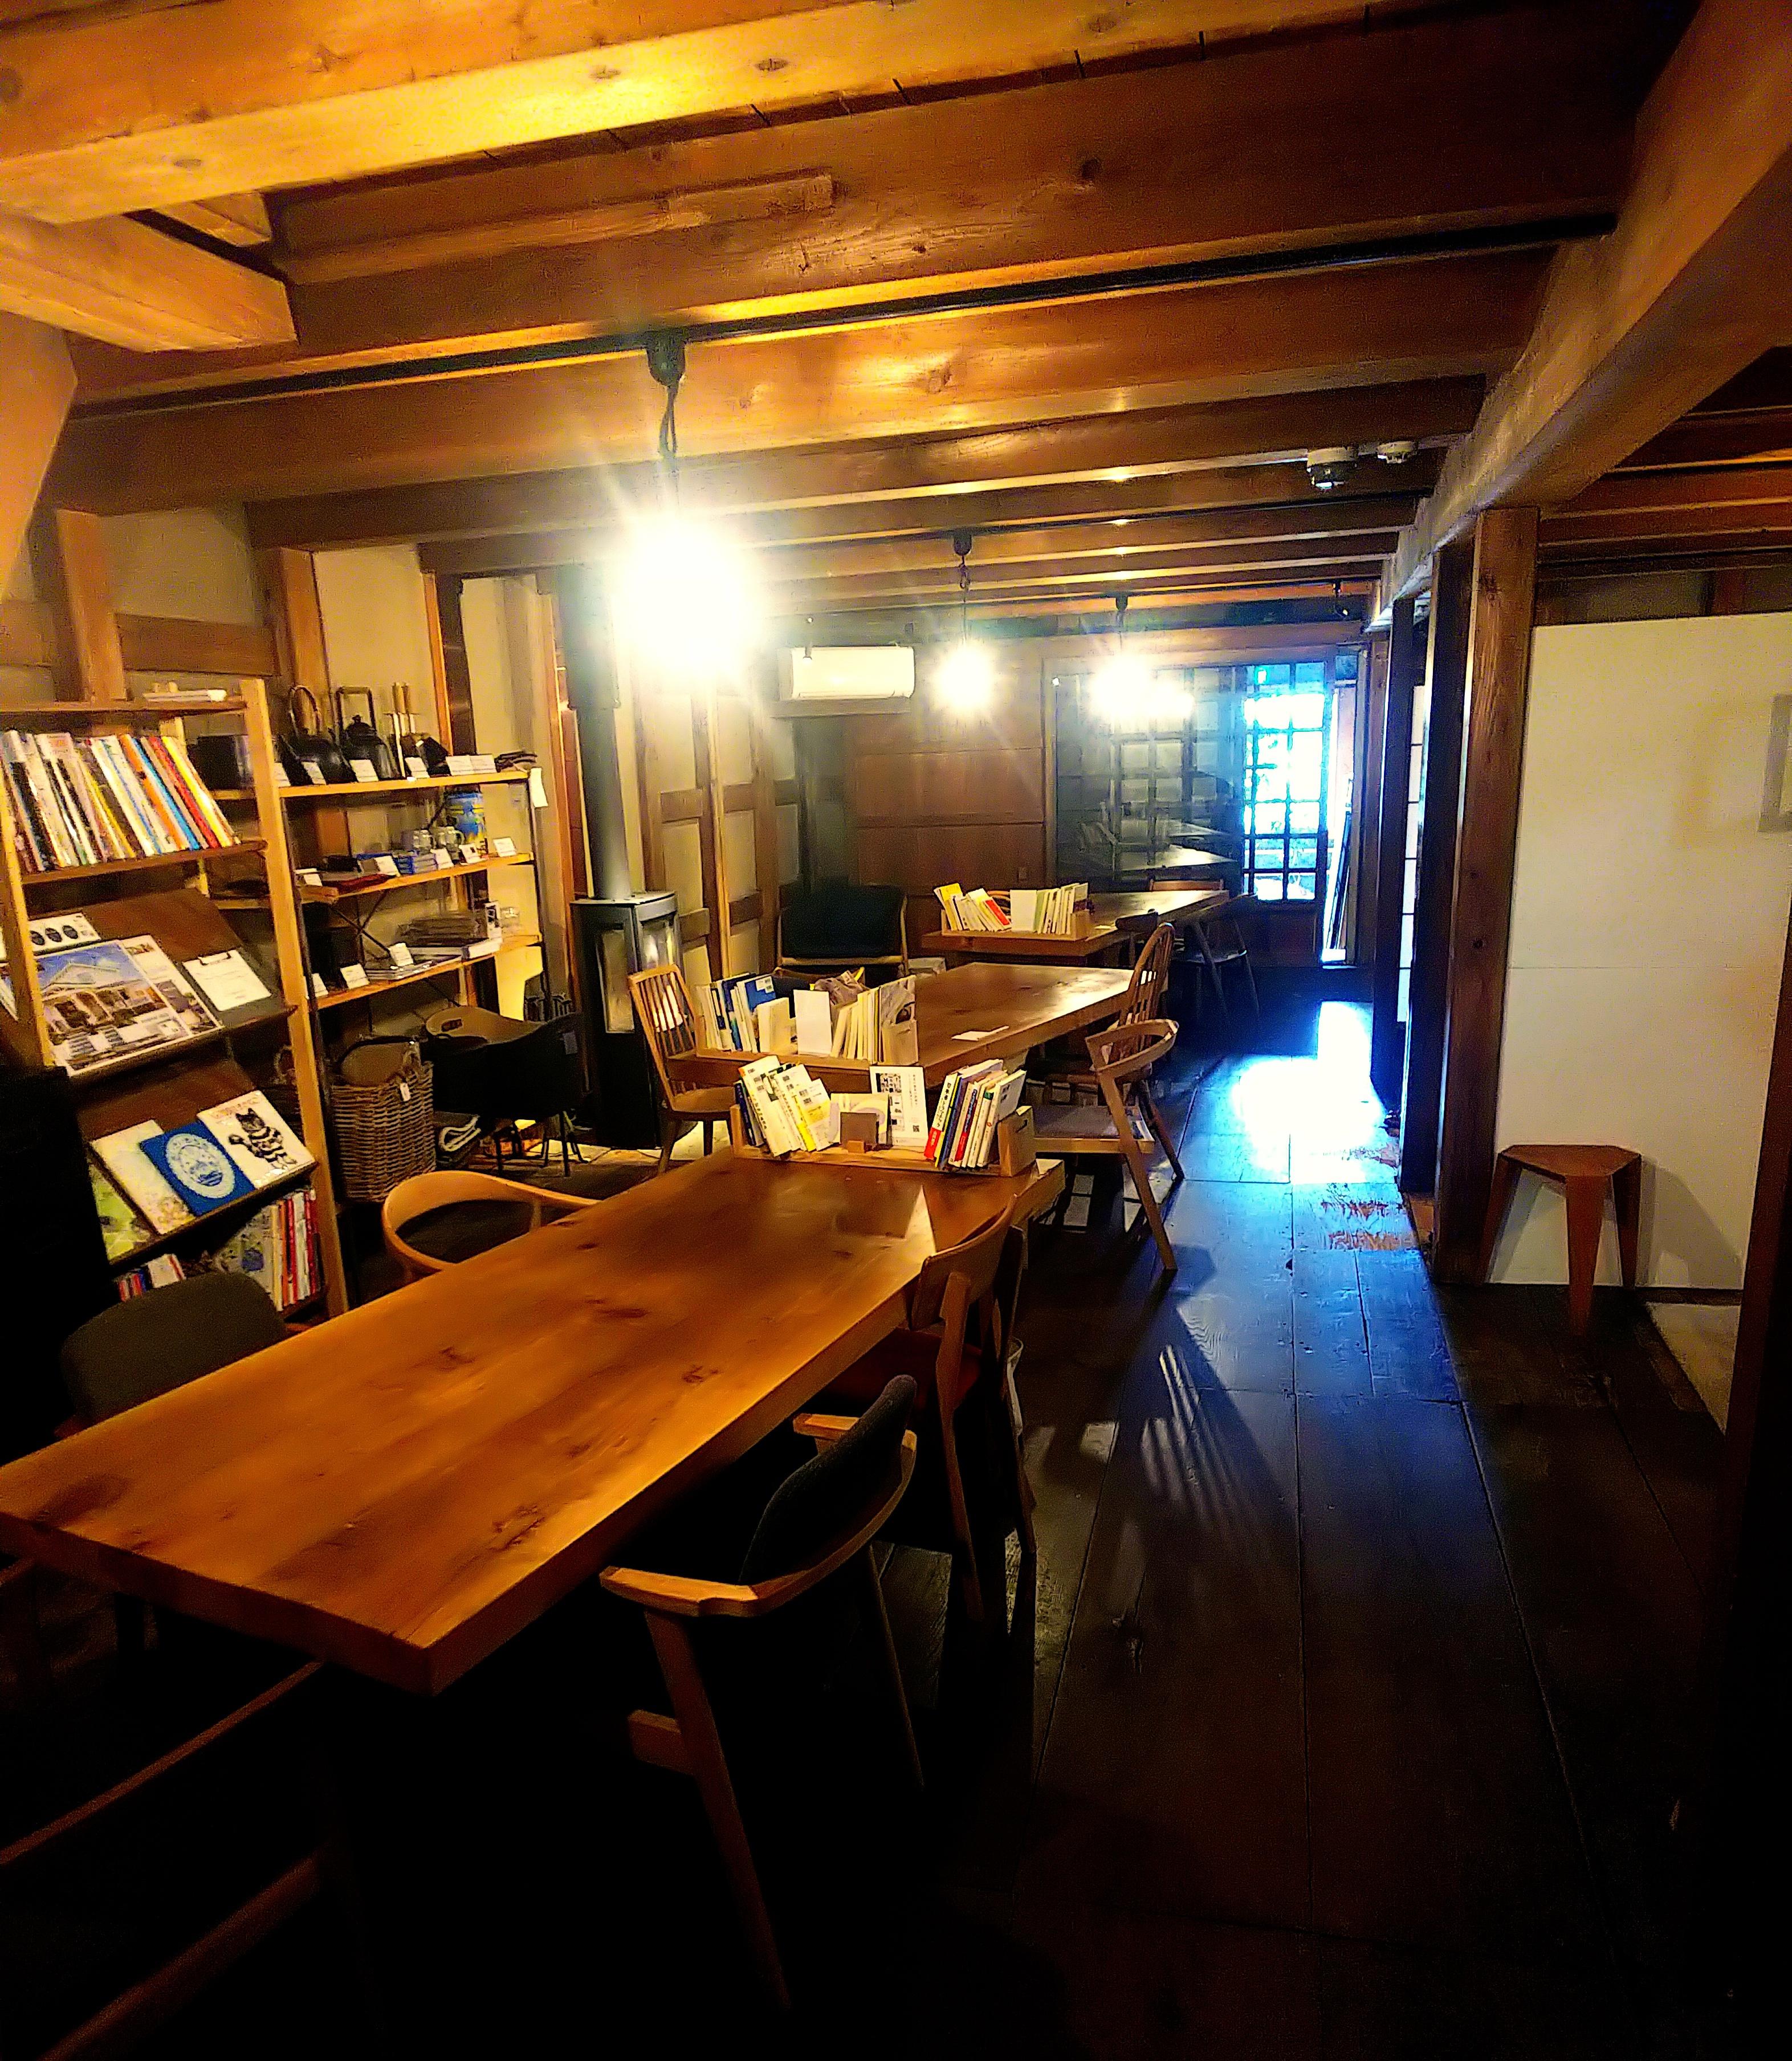 http://www.fukukomachi.com/blog/photo/C360_2020-07-16-18-57-53-921.jpg